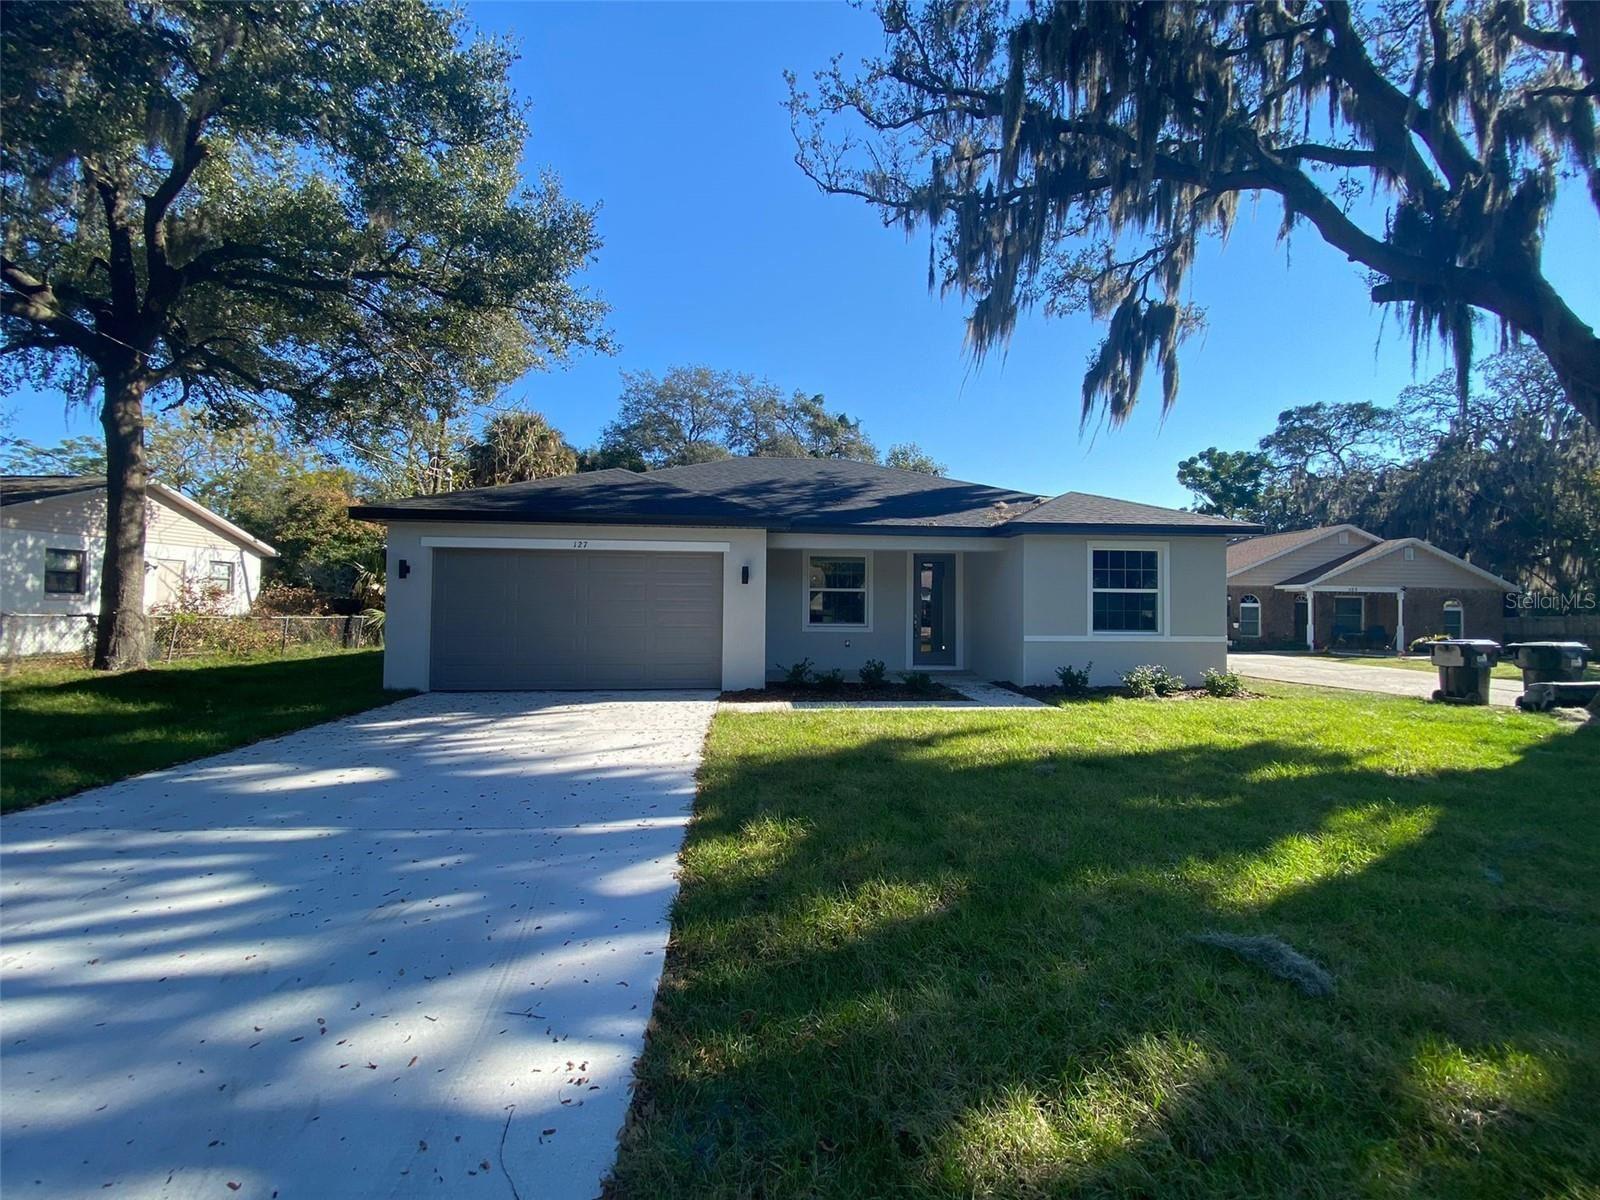 127 N BUENA VISTA AVENUE, Orlando, FL 32835 - MLS#: O5932587